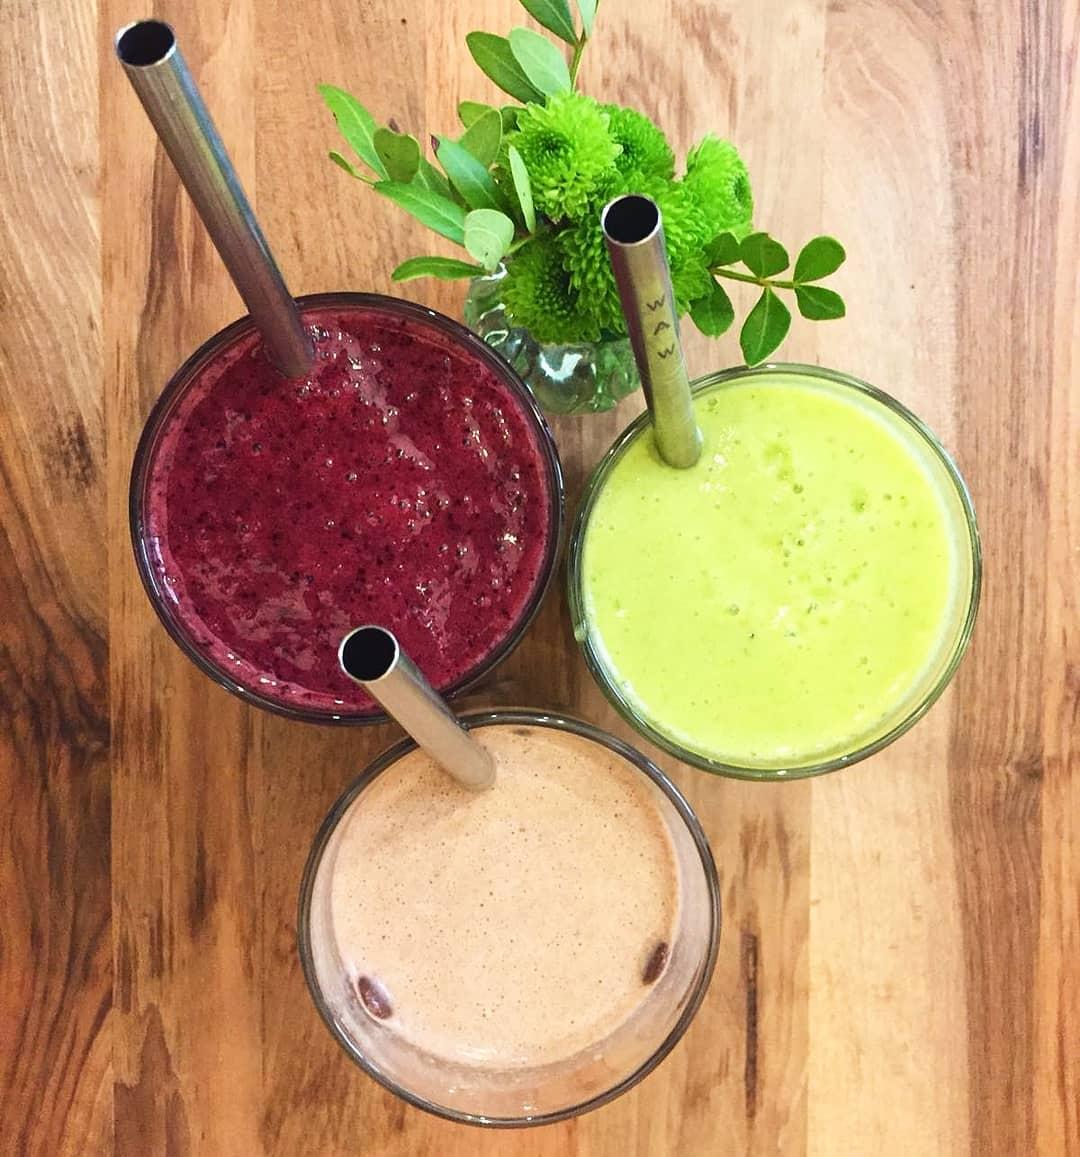 jus presse a froid, healthy juice, protein smoothie, auden montpellier